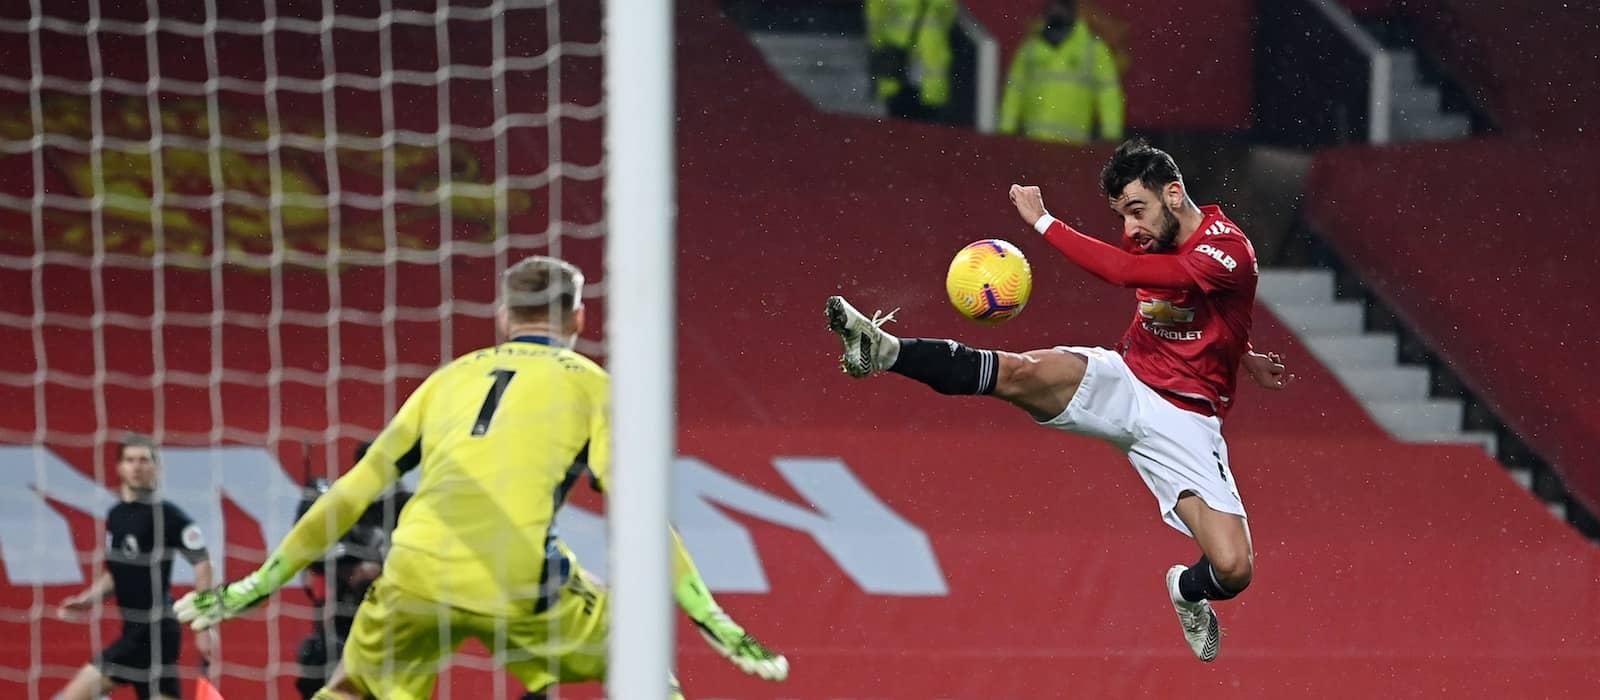 Statistics suggest Bruno Fernandes experiencing first Premier League dip